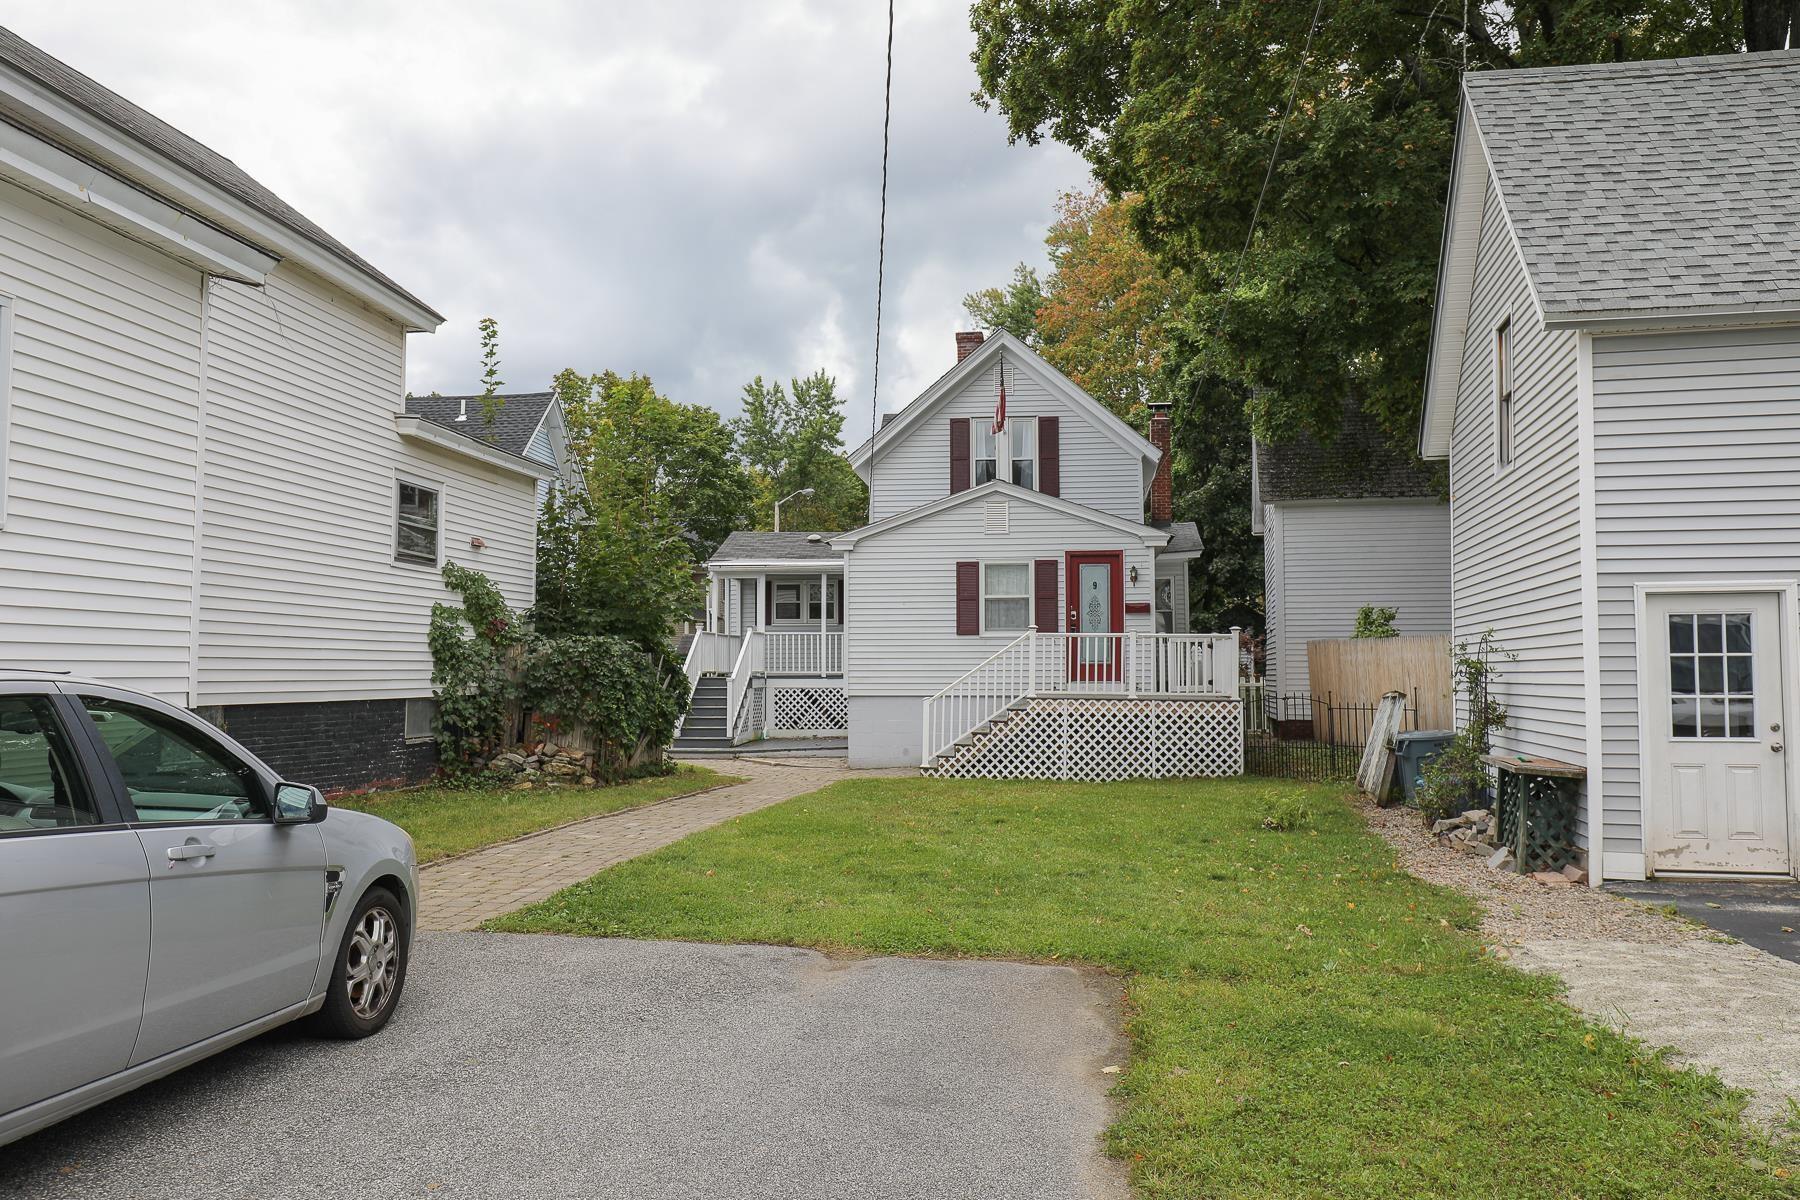 9 Lyndon Street, Concord, NH 03301